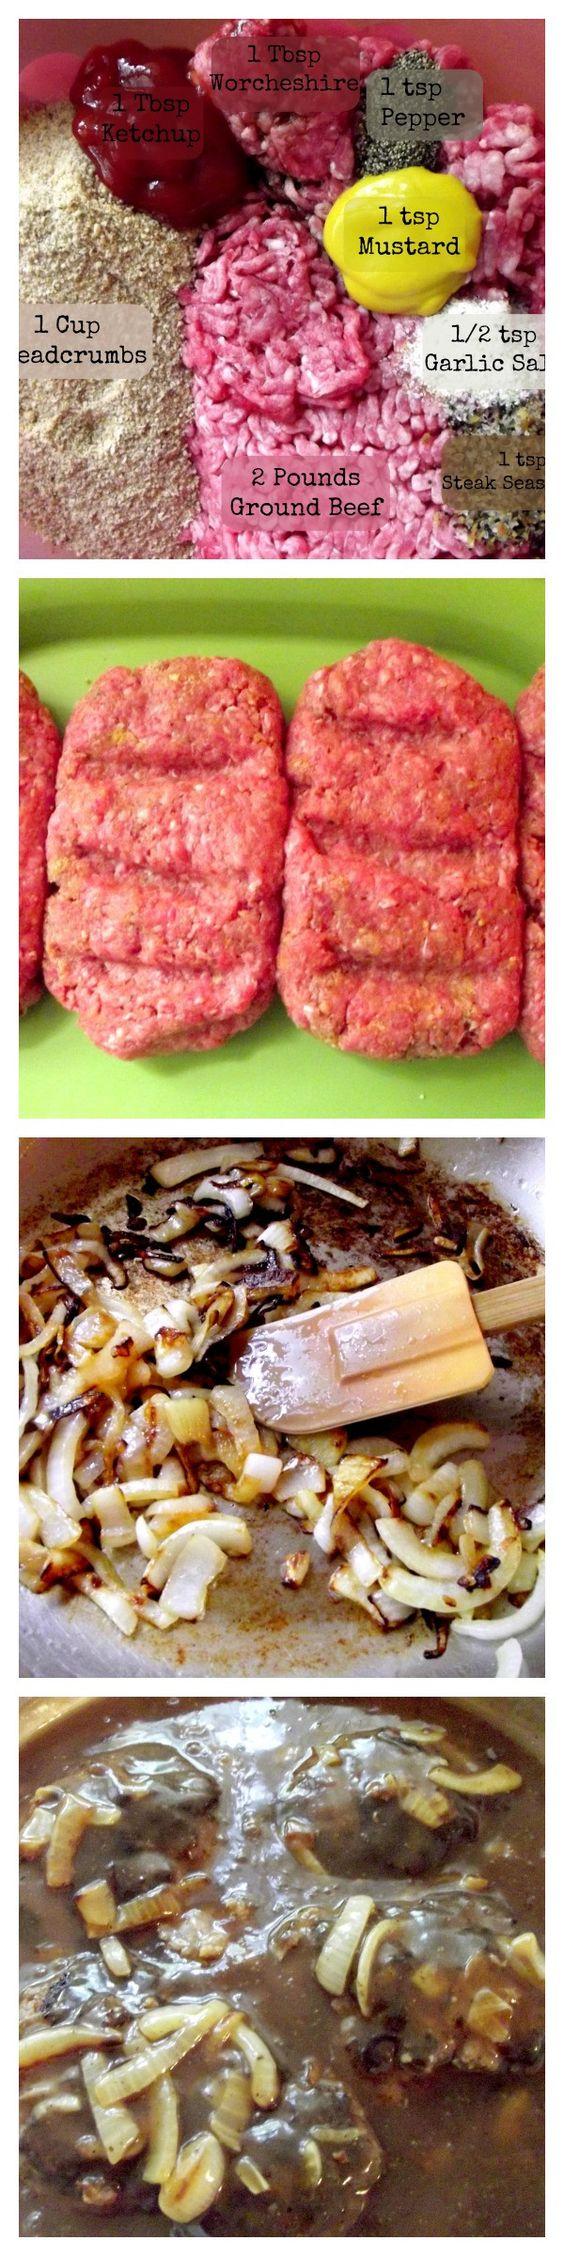 Salisbury Steak http://www.lifewiththecrustcutoff.com/salisbury-steak/